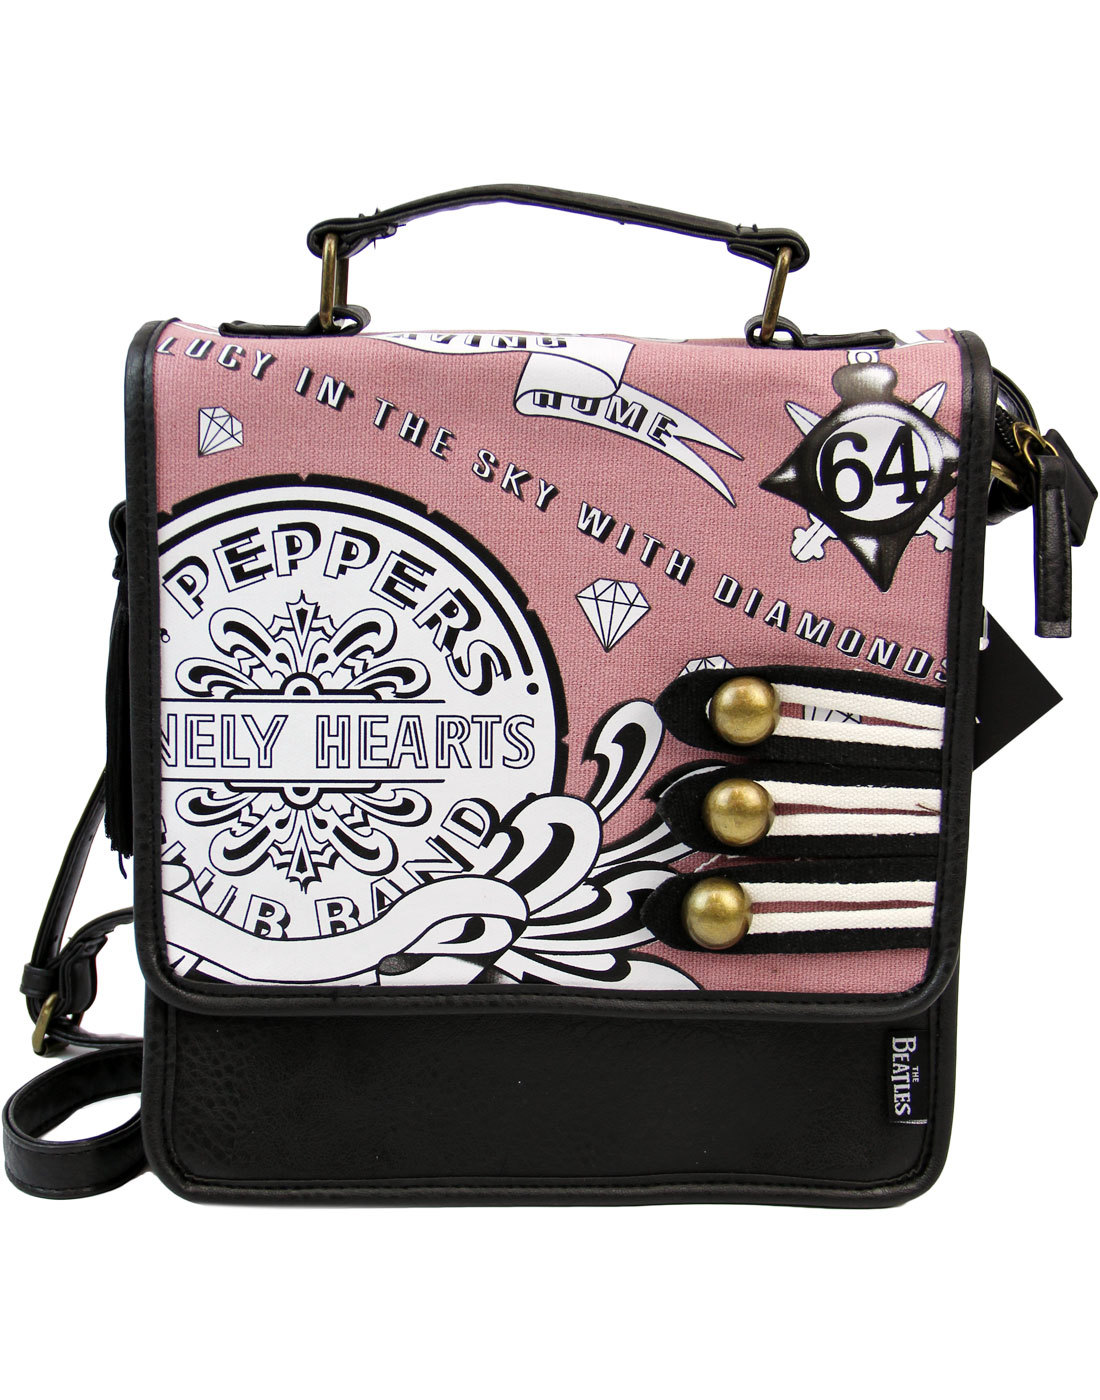 Beatles Sgt Pepper DISASTER DESIGNS Retro Mini Bag